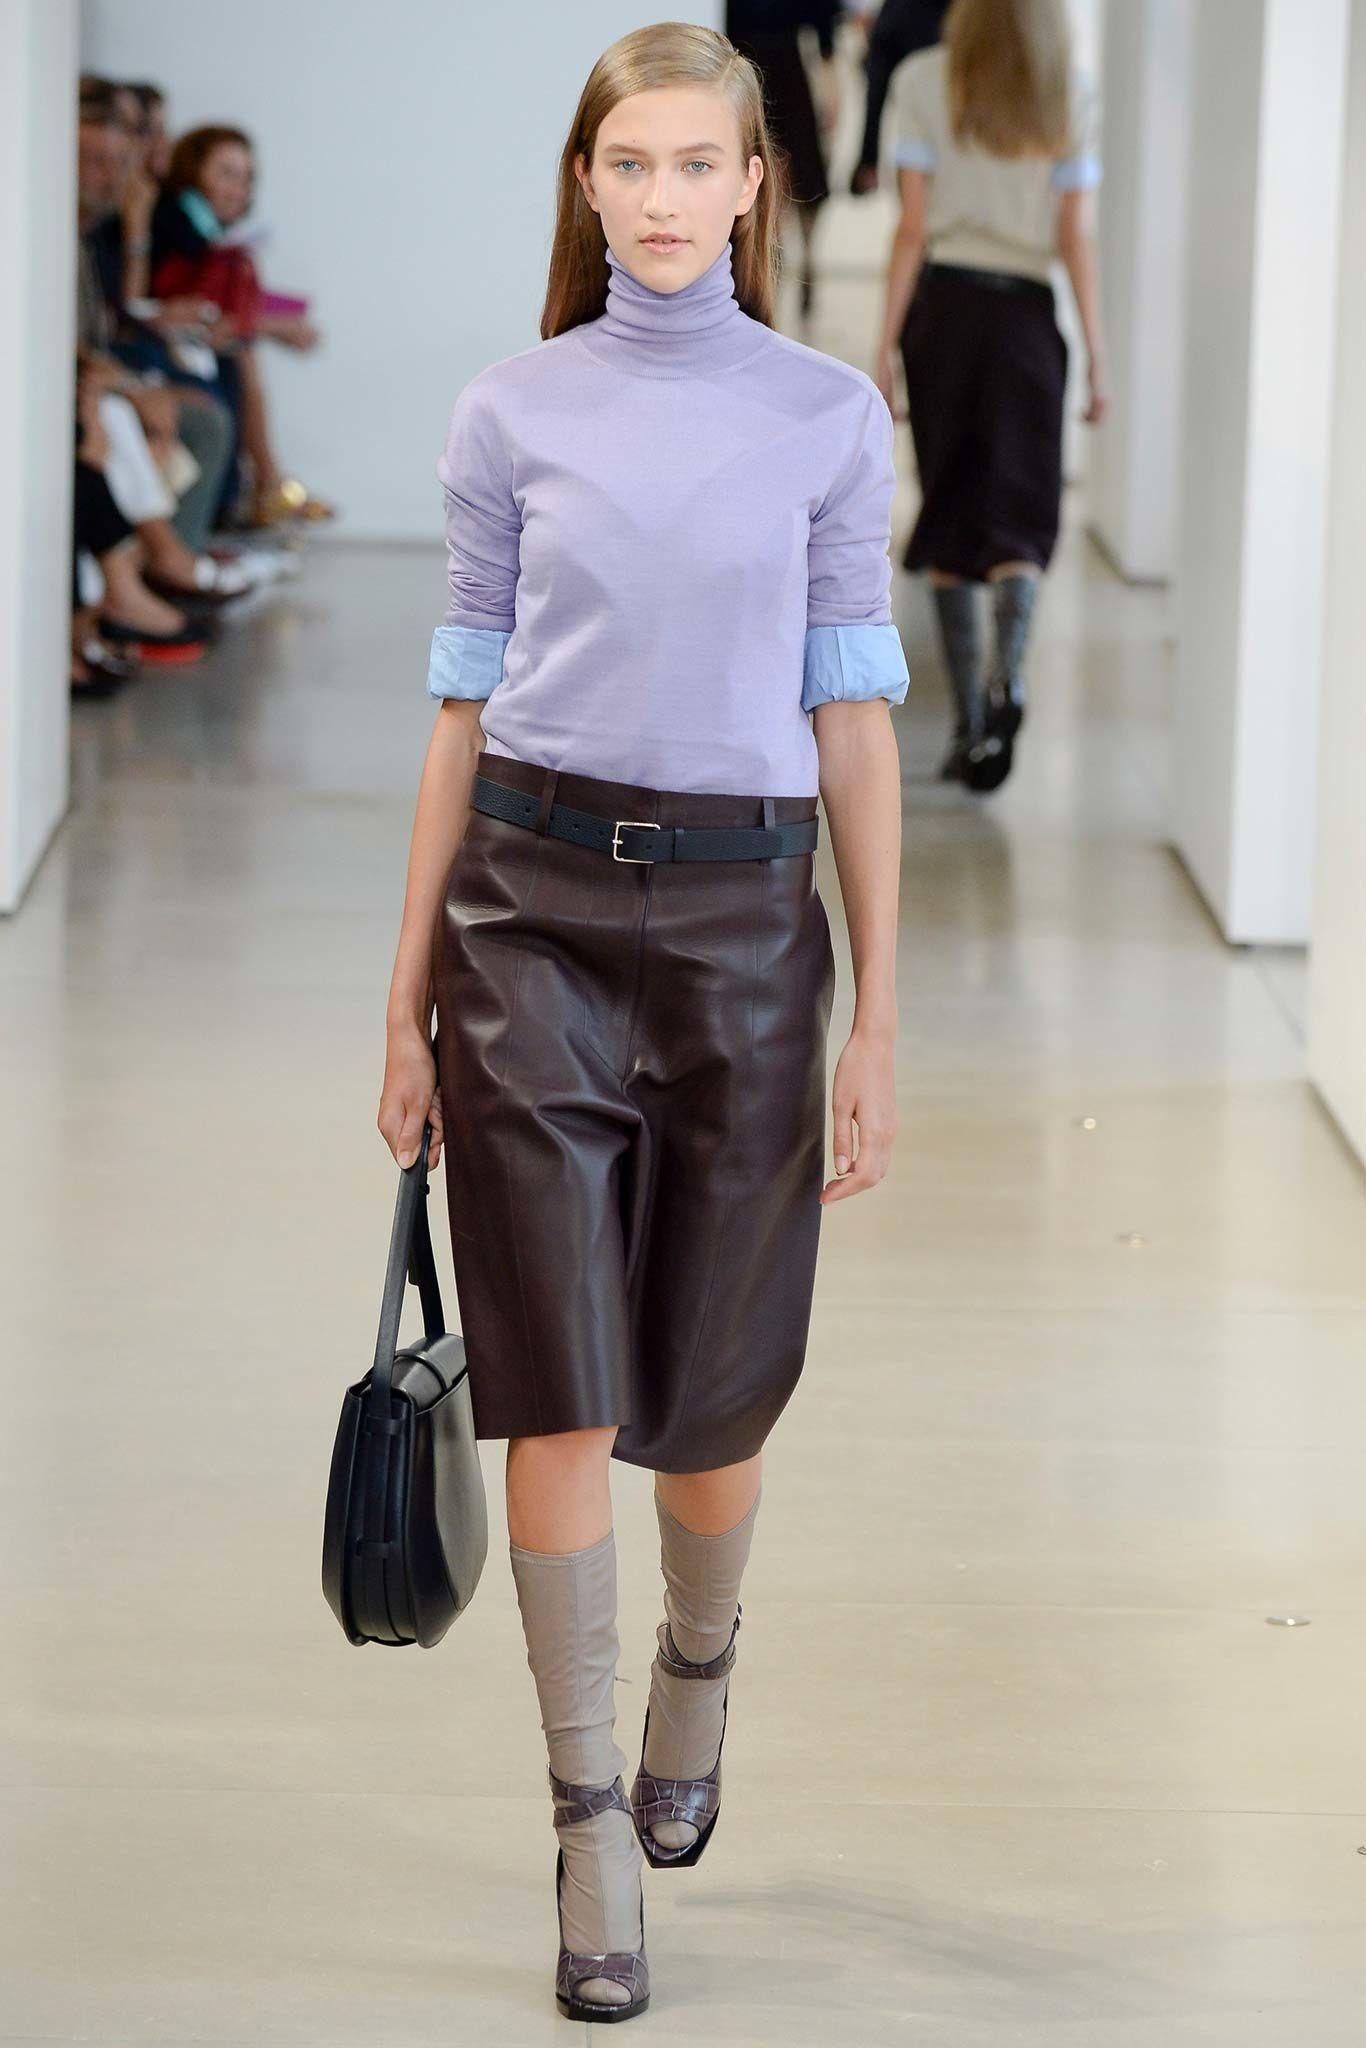 Jil Sander Spring 2015 Ready-to-Wear Fashion Show - Lee Kelters (D'MANAGEMENT)